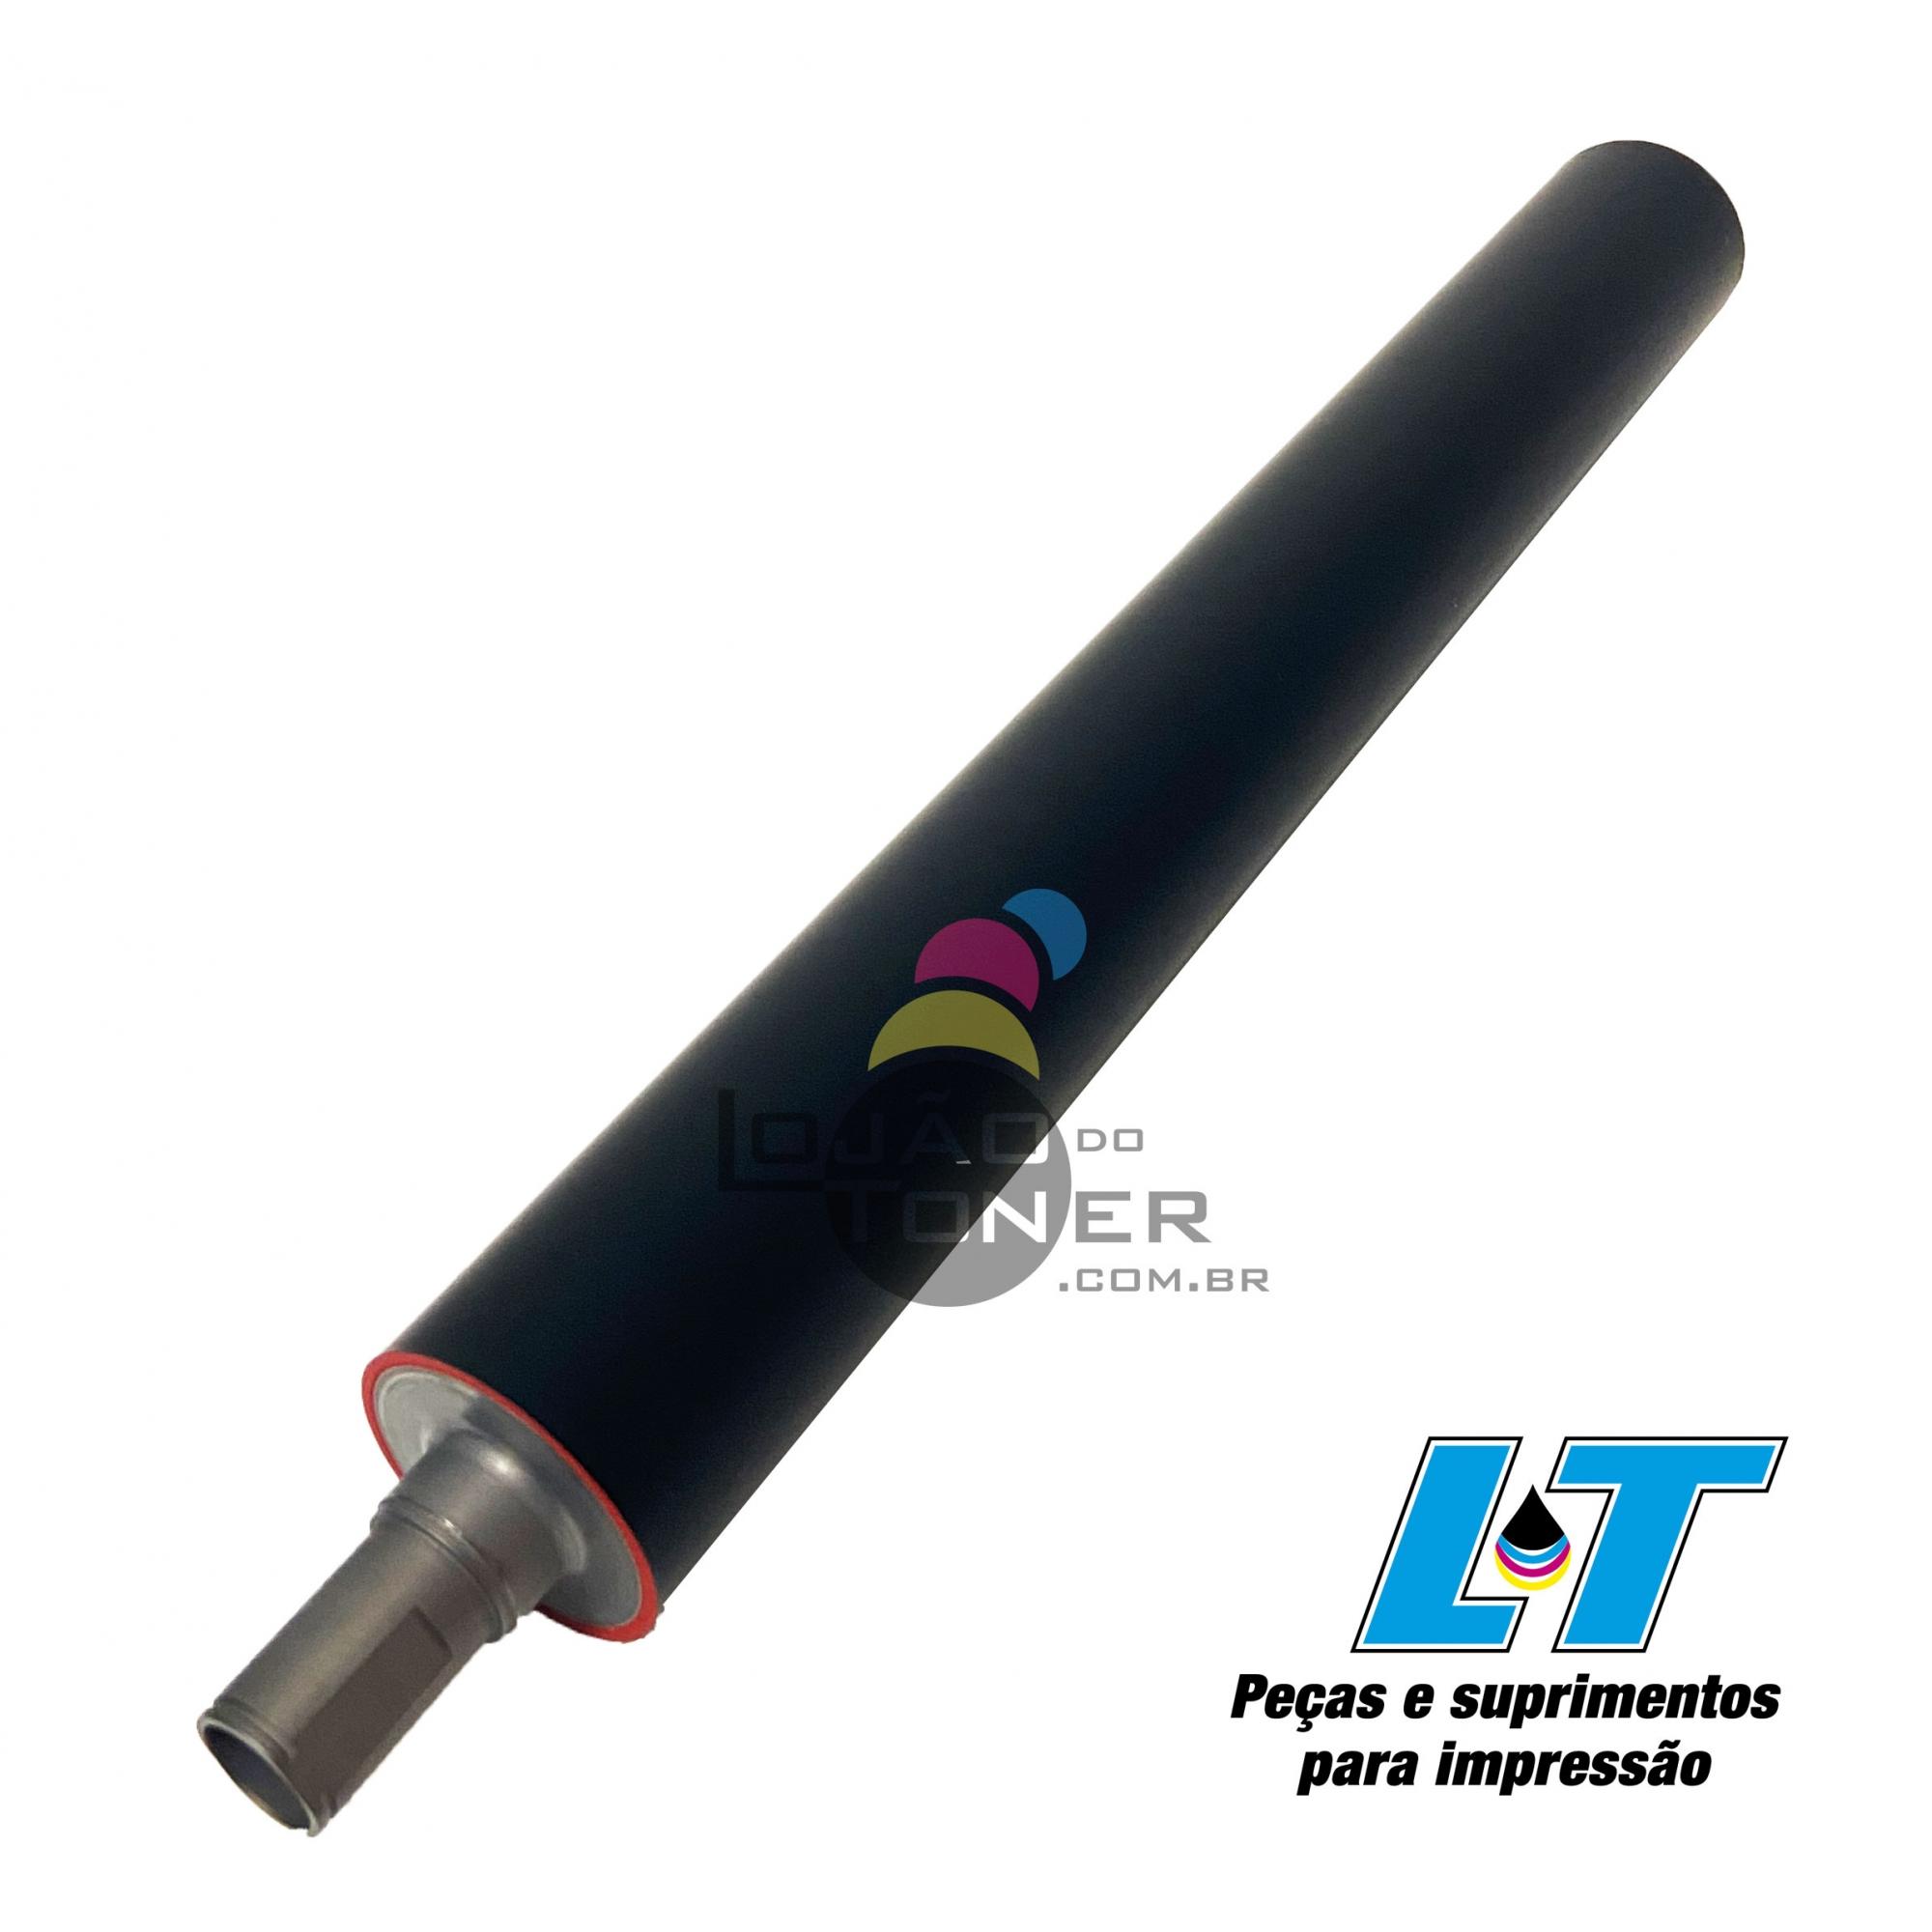 Rolo de Pressão Ricoh MPC 6502| Ricoh MPC 8002| Ricoh PRO C 5100 | Ricoh Pro C 5110 - AE020215 - Compatível